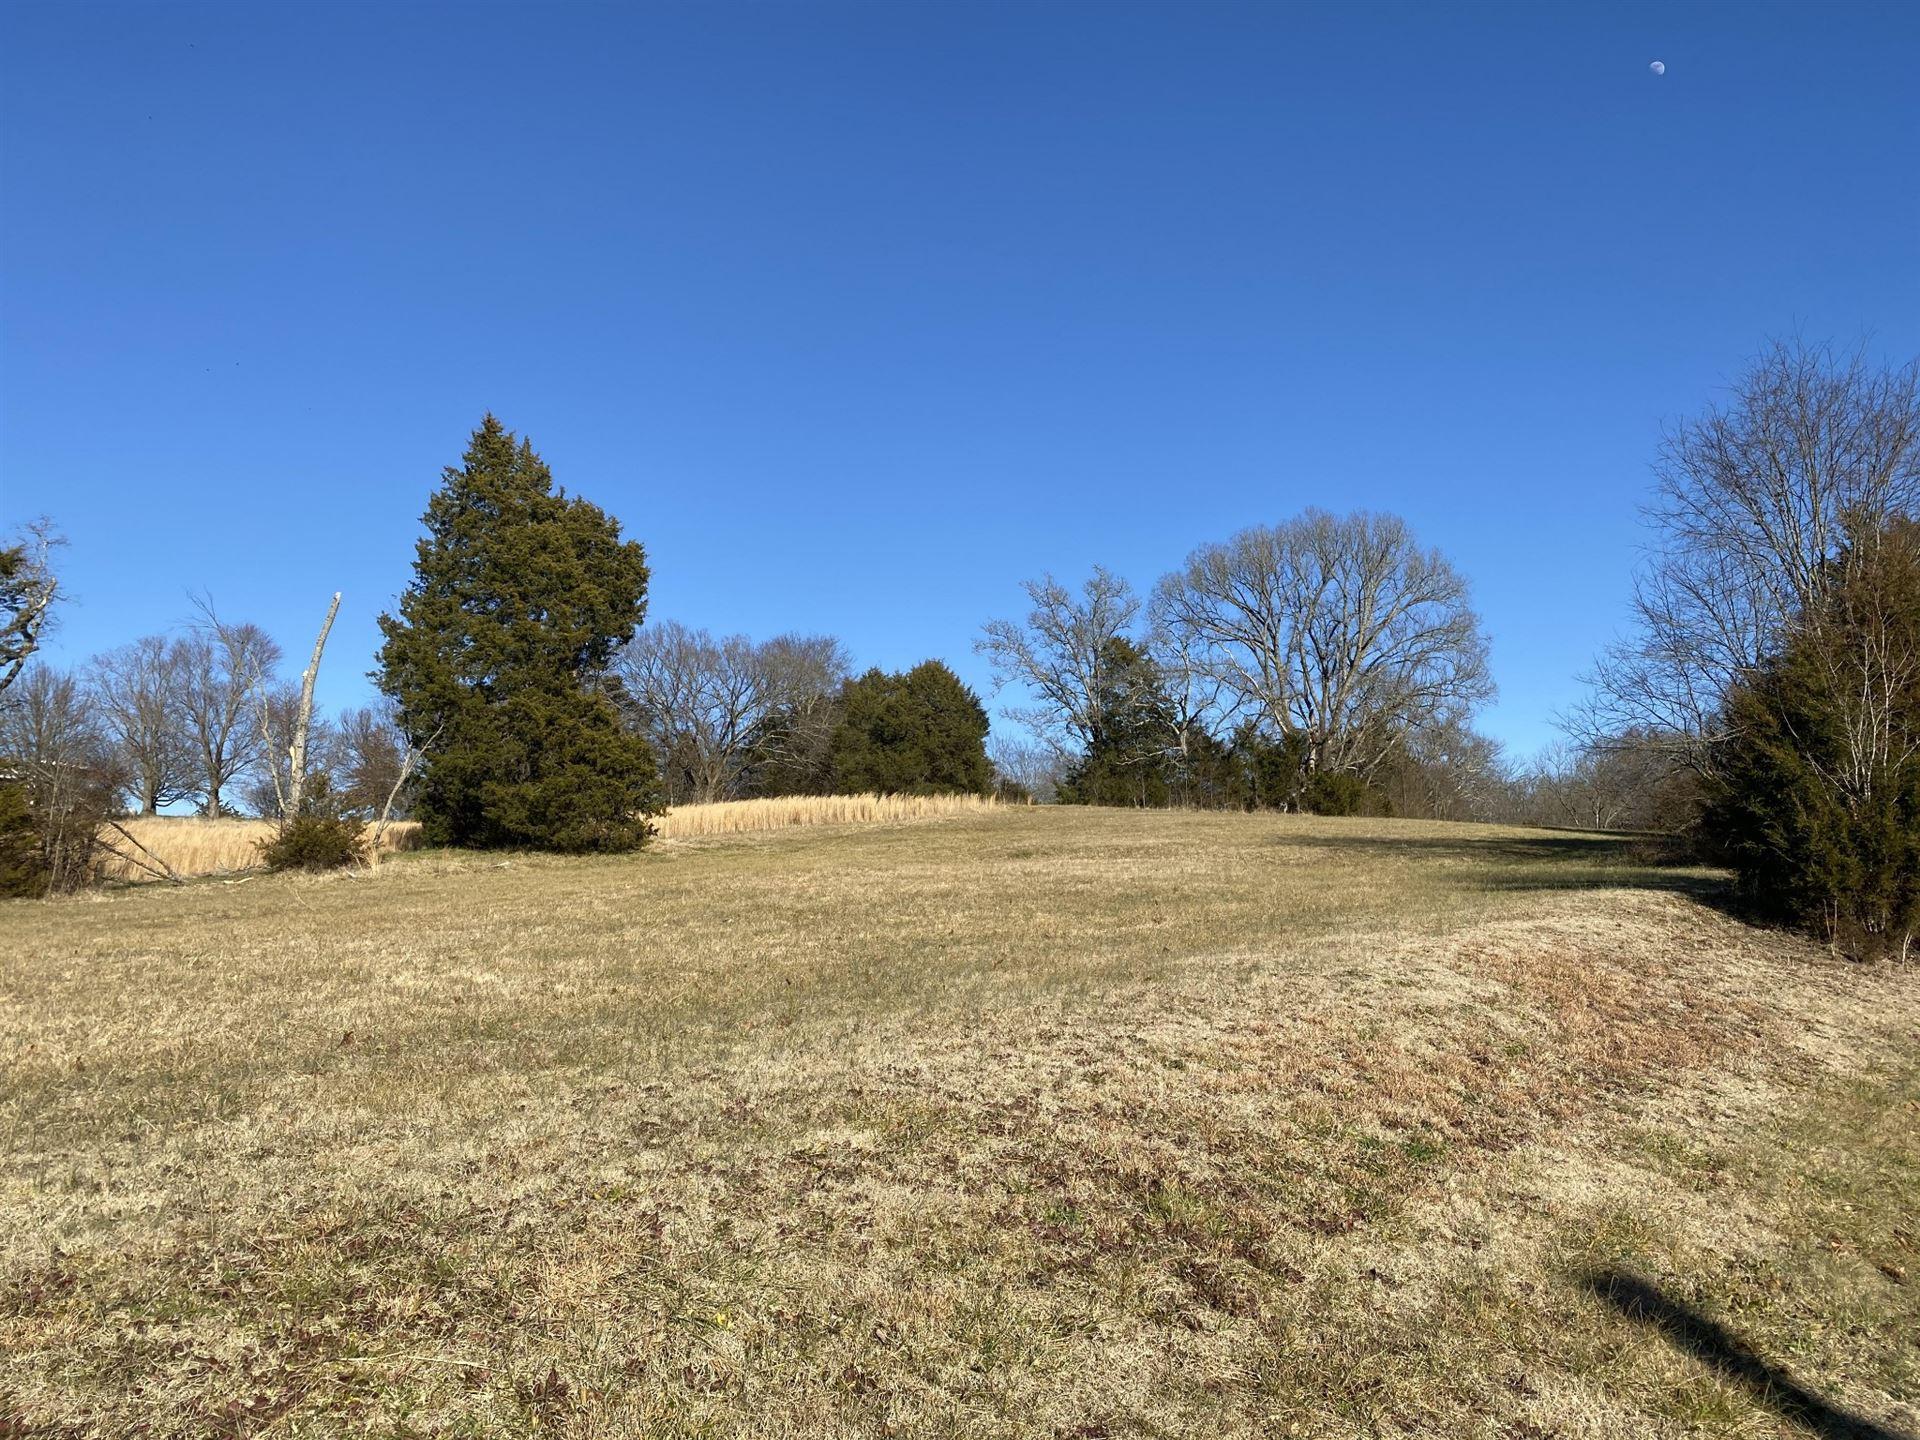 Photo of 9835 Clovercroft Rd, Nolensville, TN 37135 (MLS # 2222656)